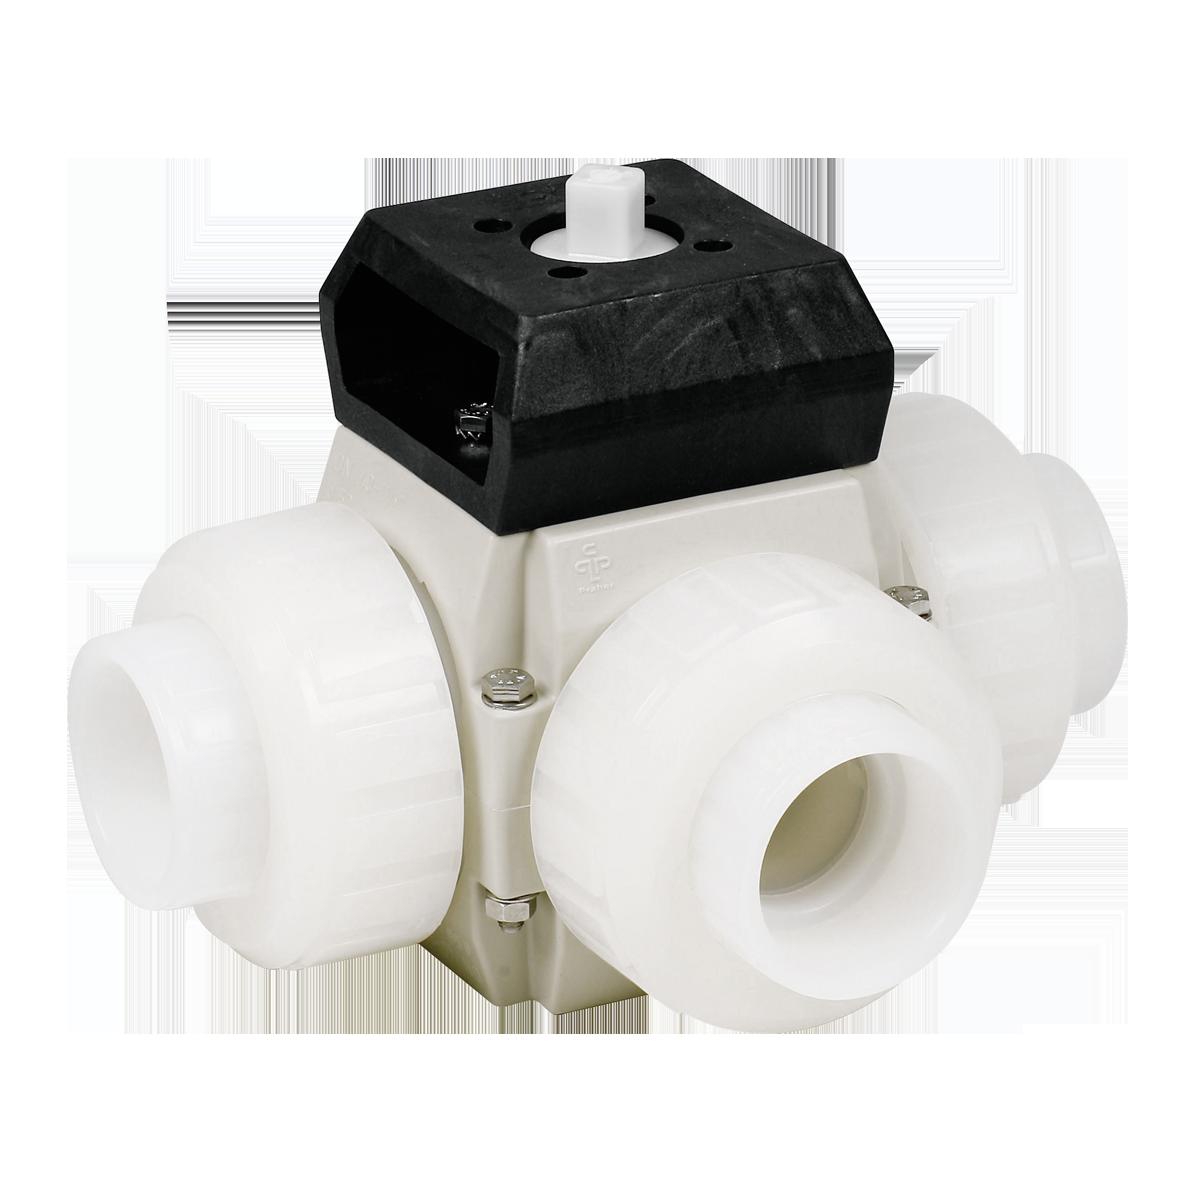 Praher 3-way ball valve S4 PVDF with adapter set, white, black